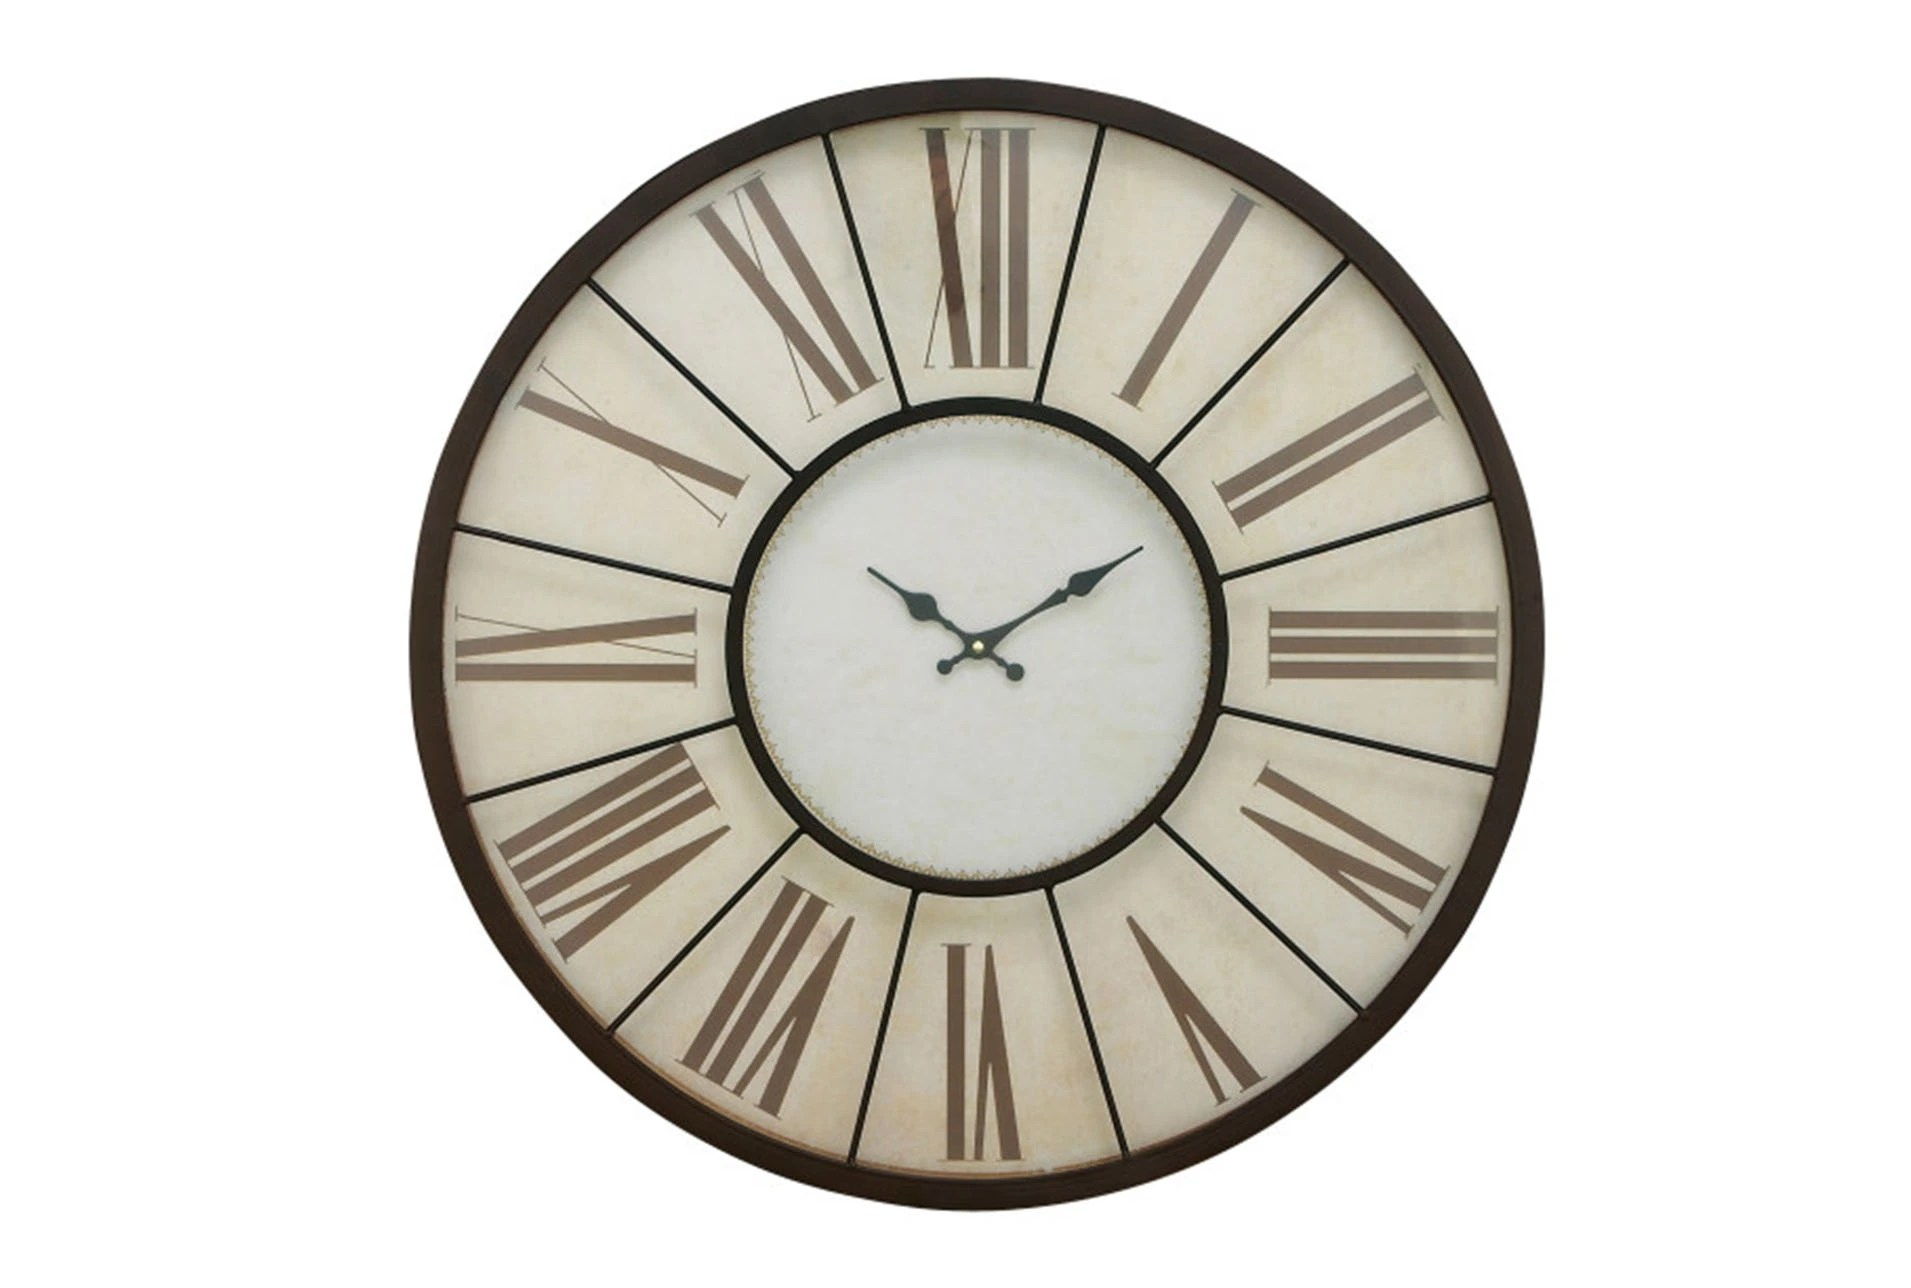 Fancy Inch Roman Numeral Wall Clock Has Been Successfully Added Toyour Inch Roman Numeral Wall Clock Living Spaces Roman Numeral Clock Printable Roman Numeral Clock Amazon houzz-03 Roman Numeral Clock